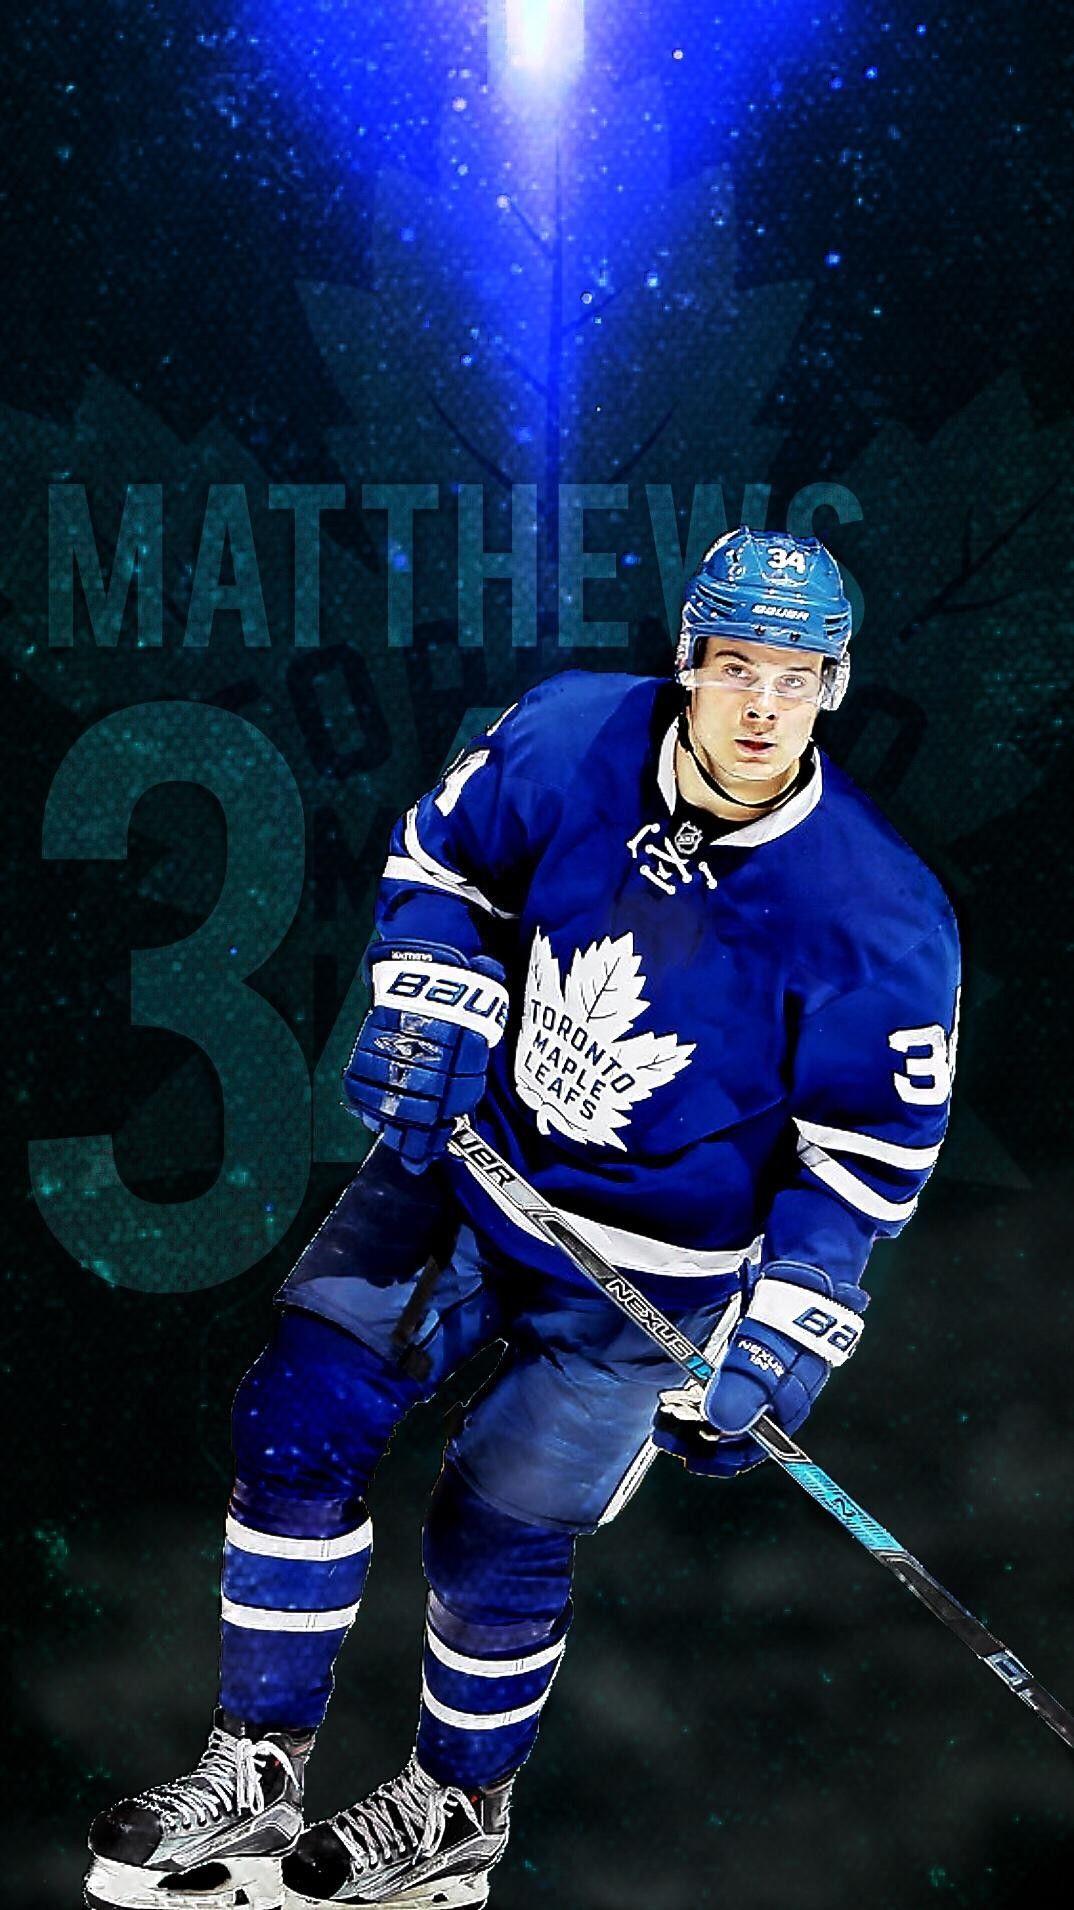 A Matthews Toronto Maple Leafs Hockey Maple Leafs Hockey Toronto Maple Leafs Wallpaper